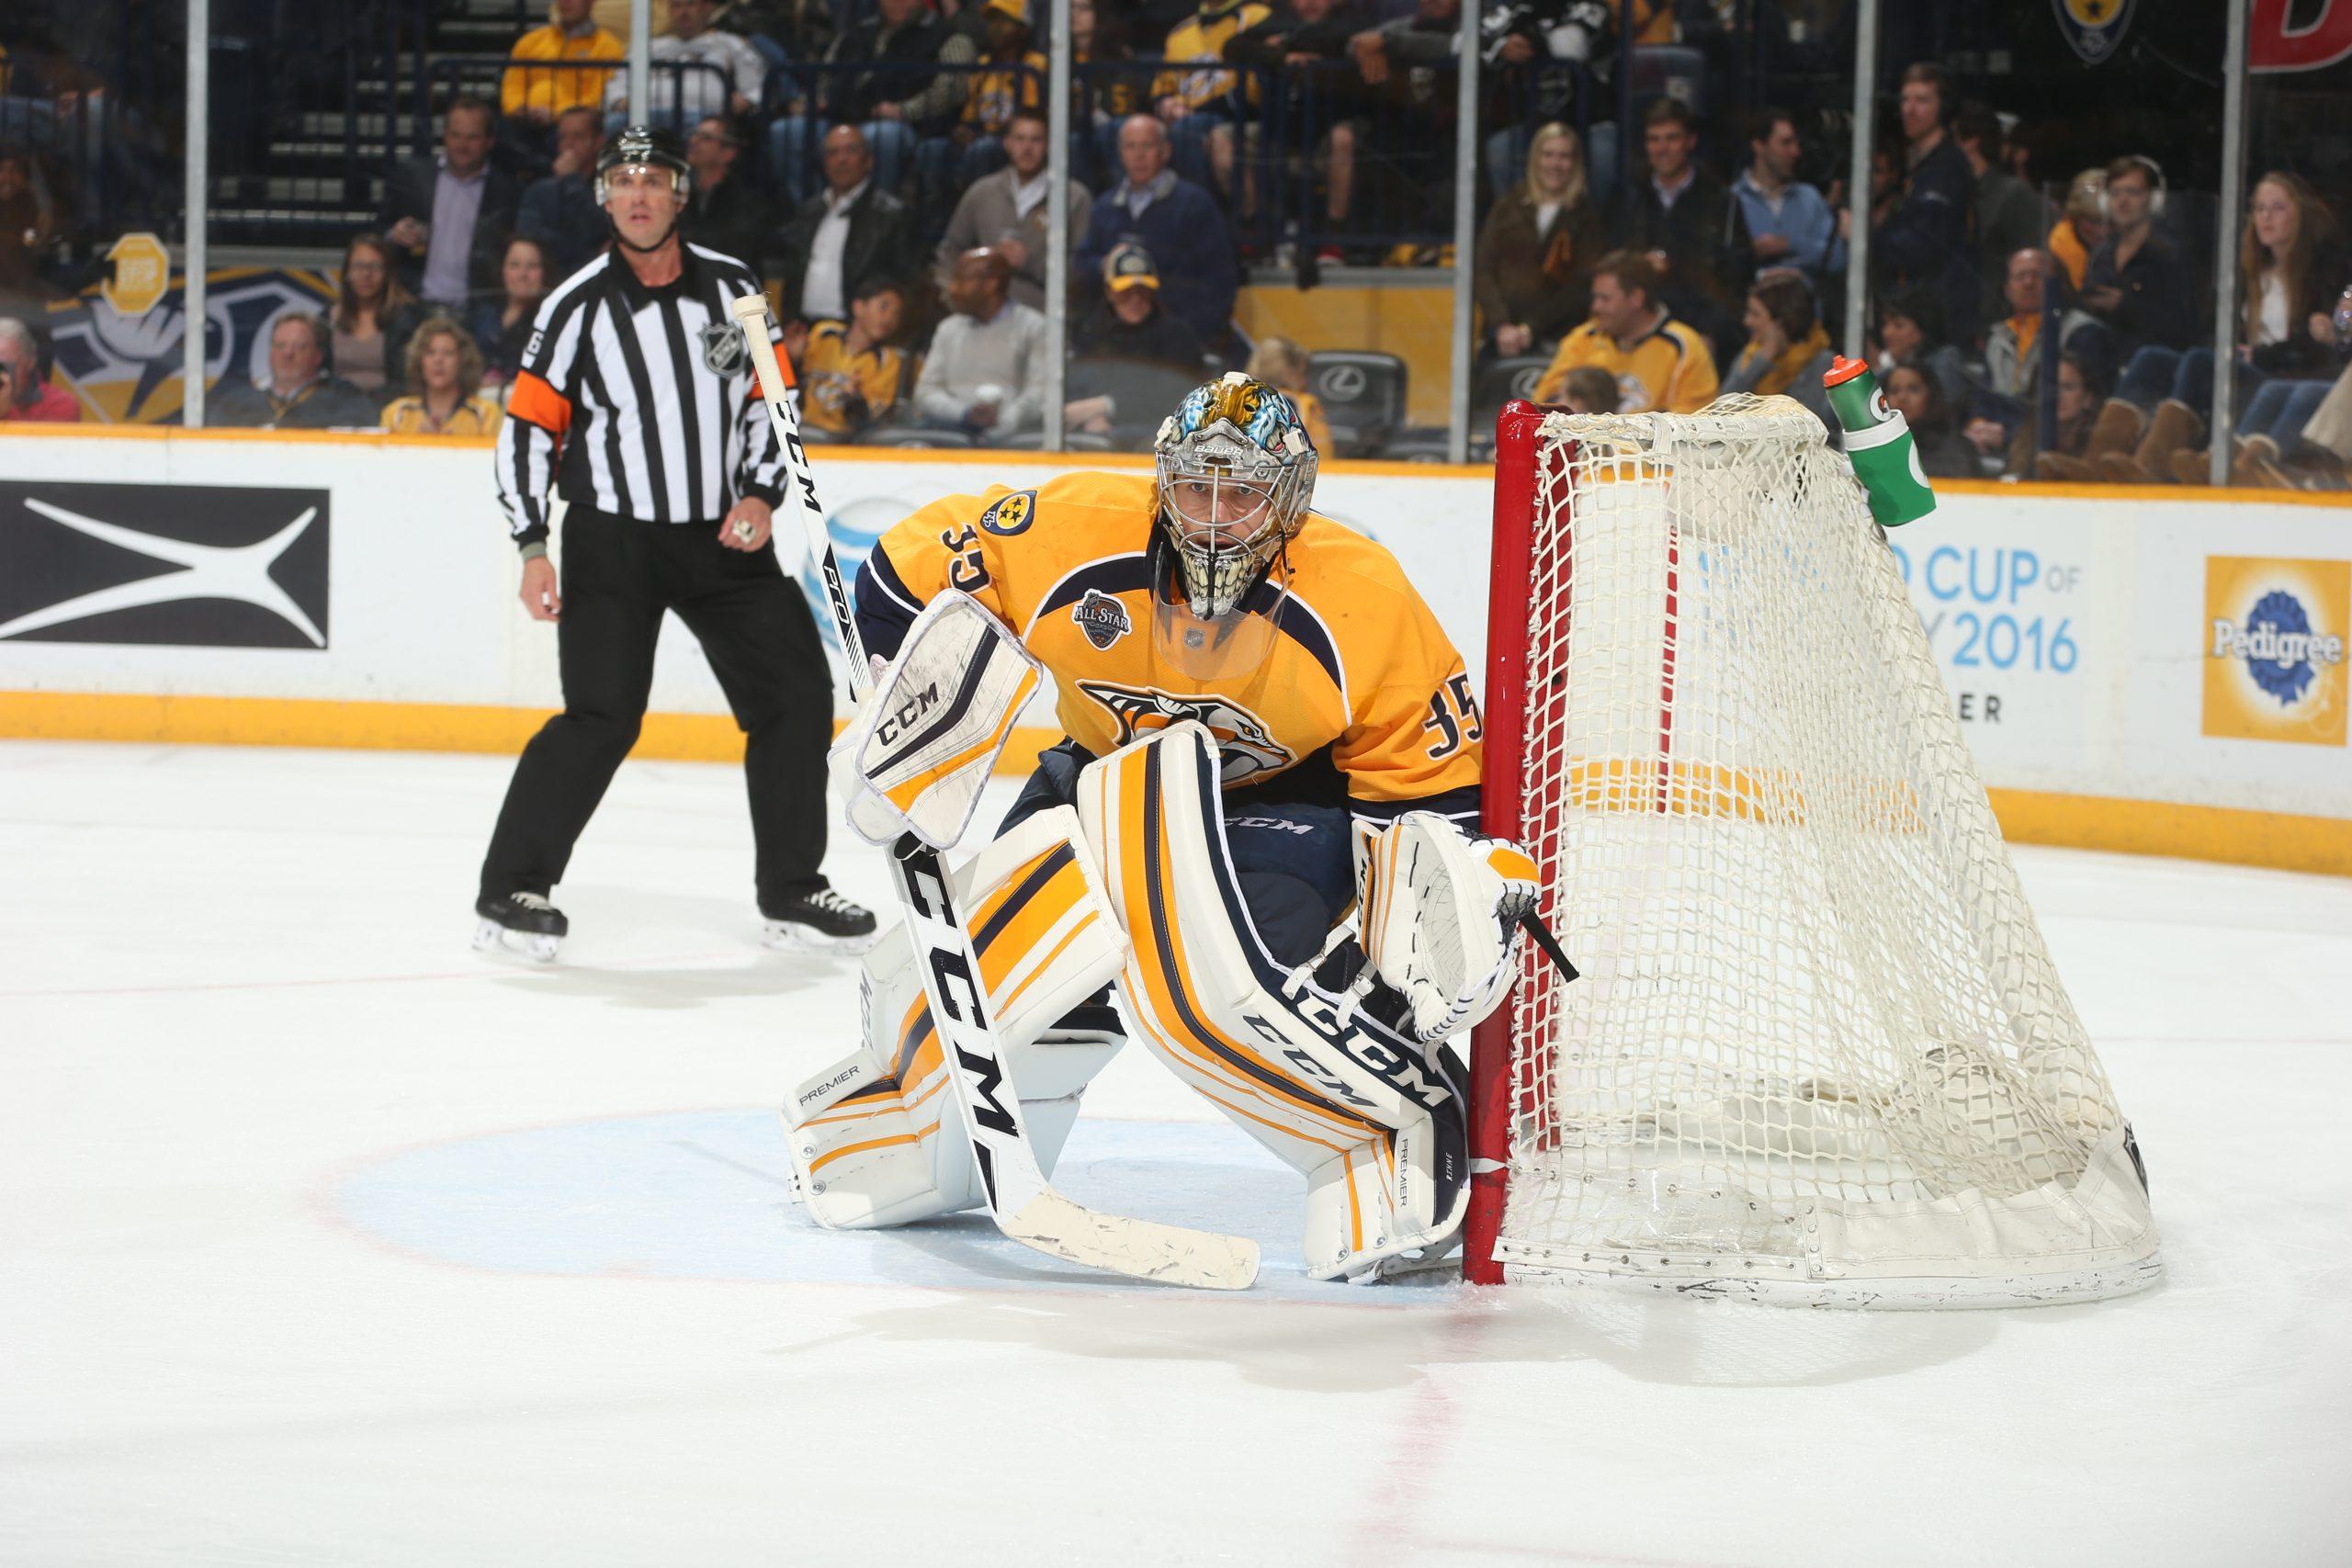 Pekka Rinne Wins Vezina Trophy as NHL's Best Goaltender